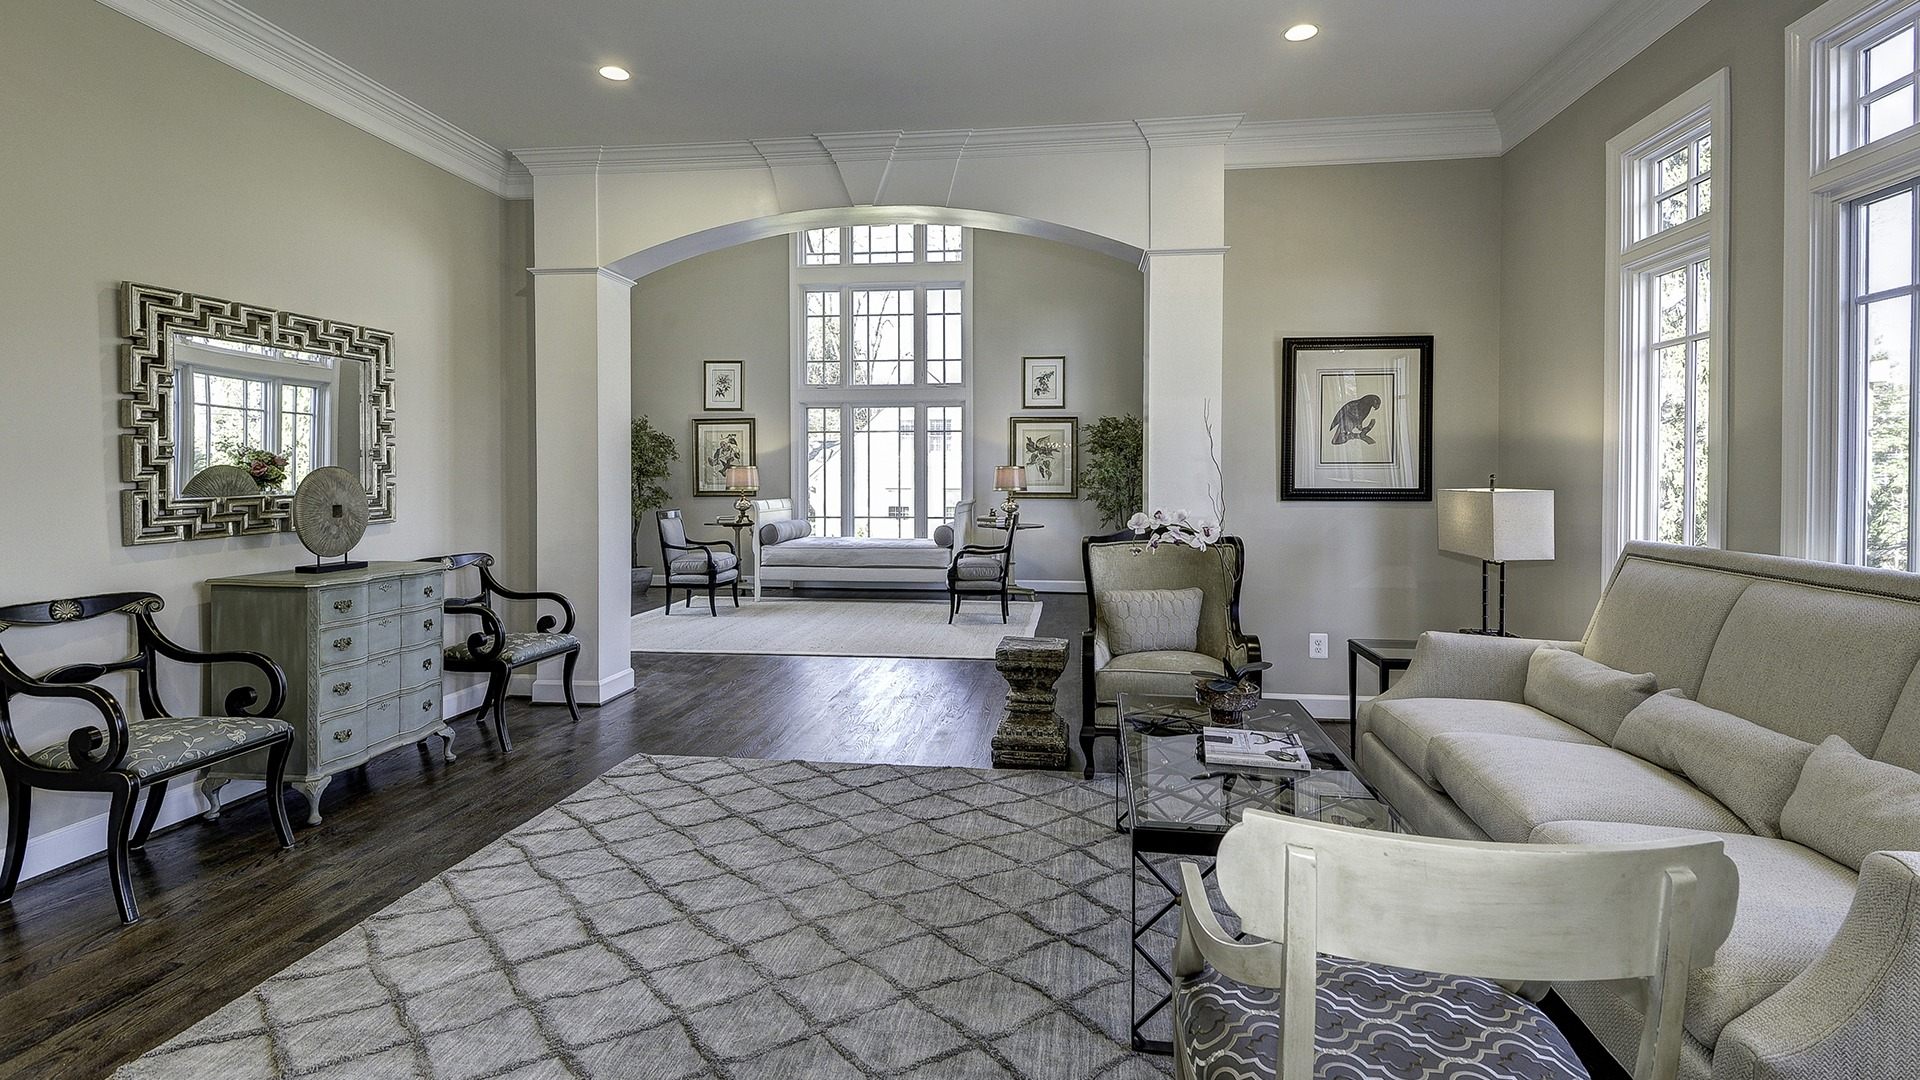 The Living Room in Carper Street, a Gulick   One custom home.